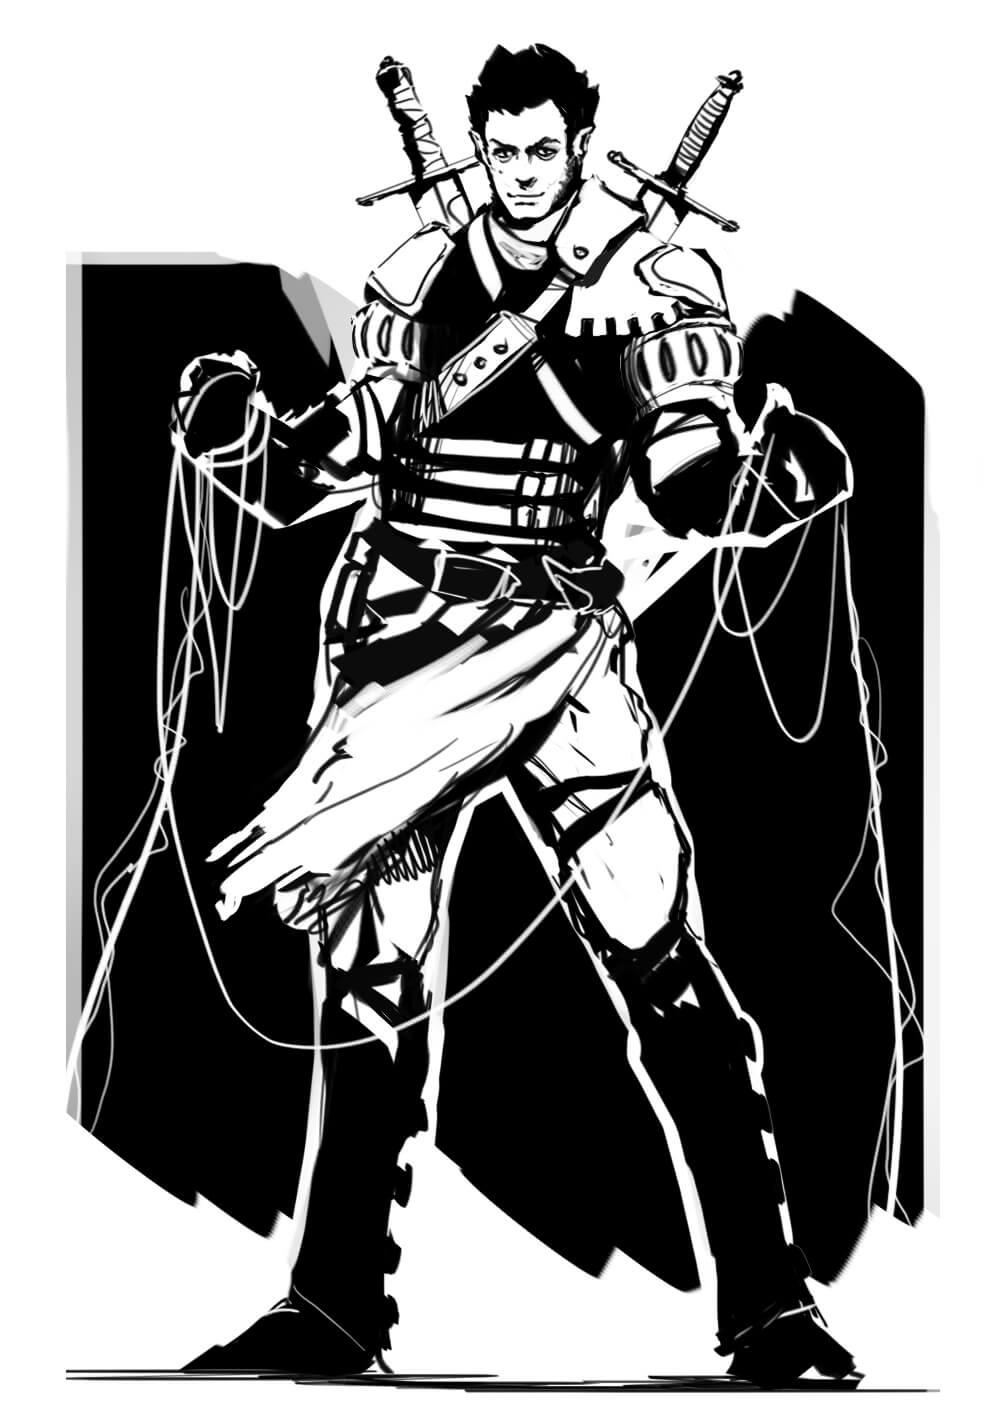 felix-haas-character-concept-art-char_sketches004gg